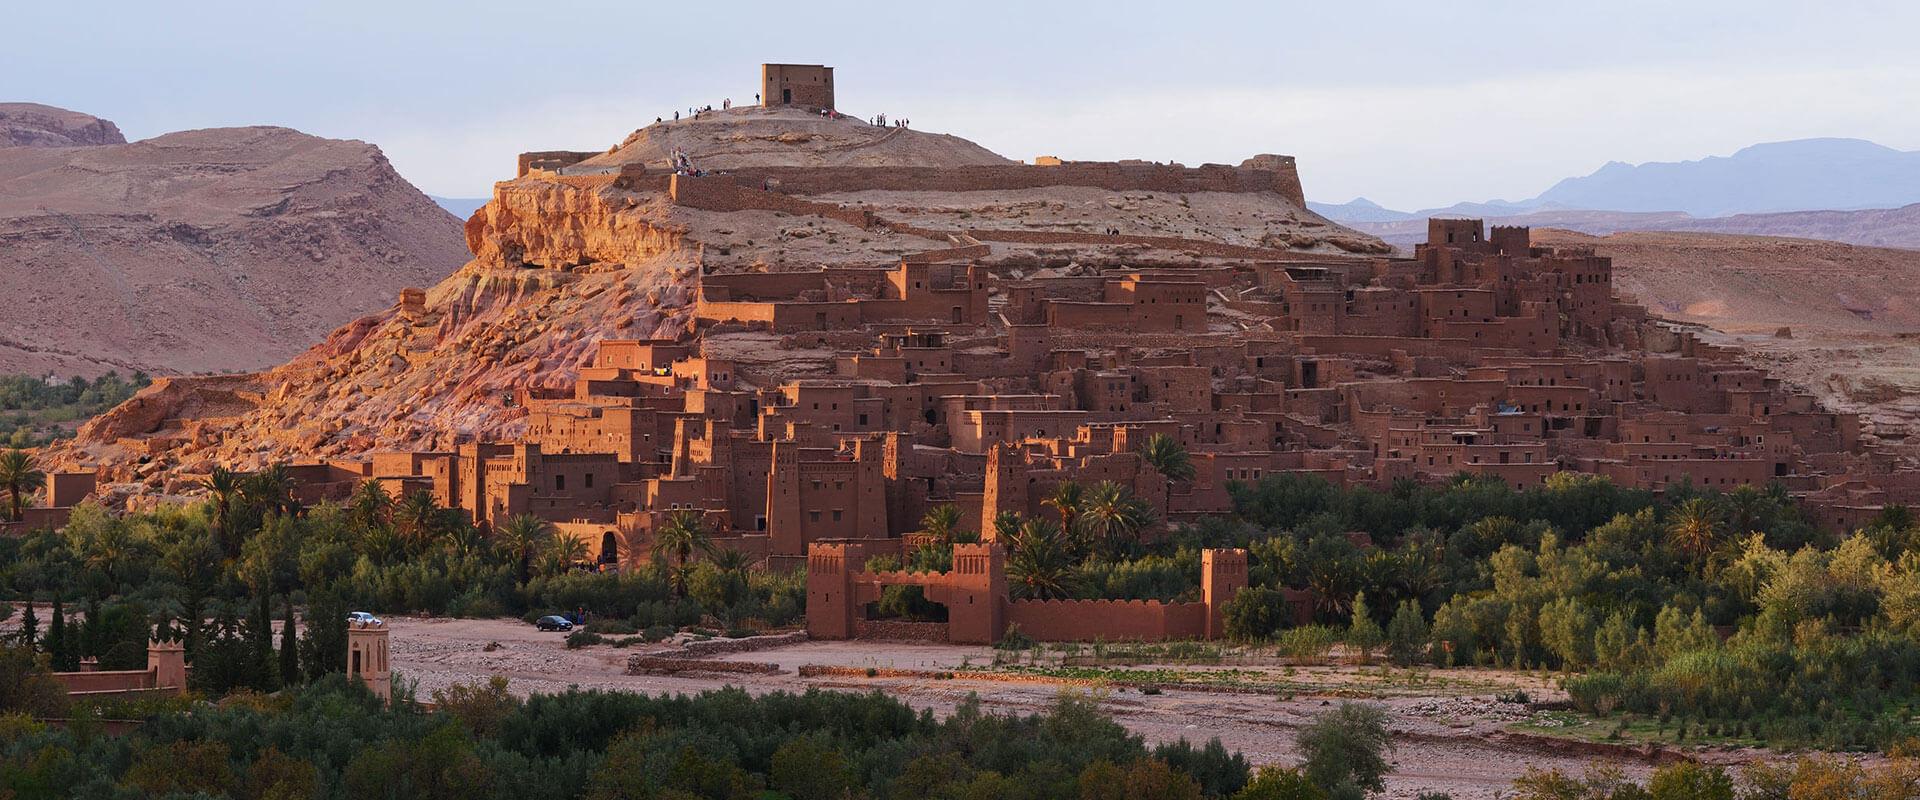 Voyages- Expeditions Maroc - haut atlas et desert en vtt